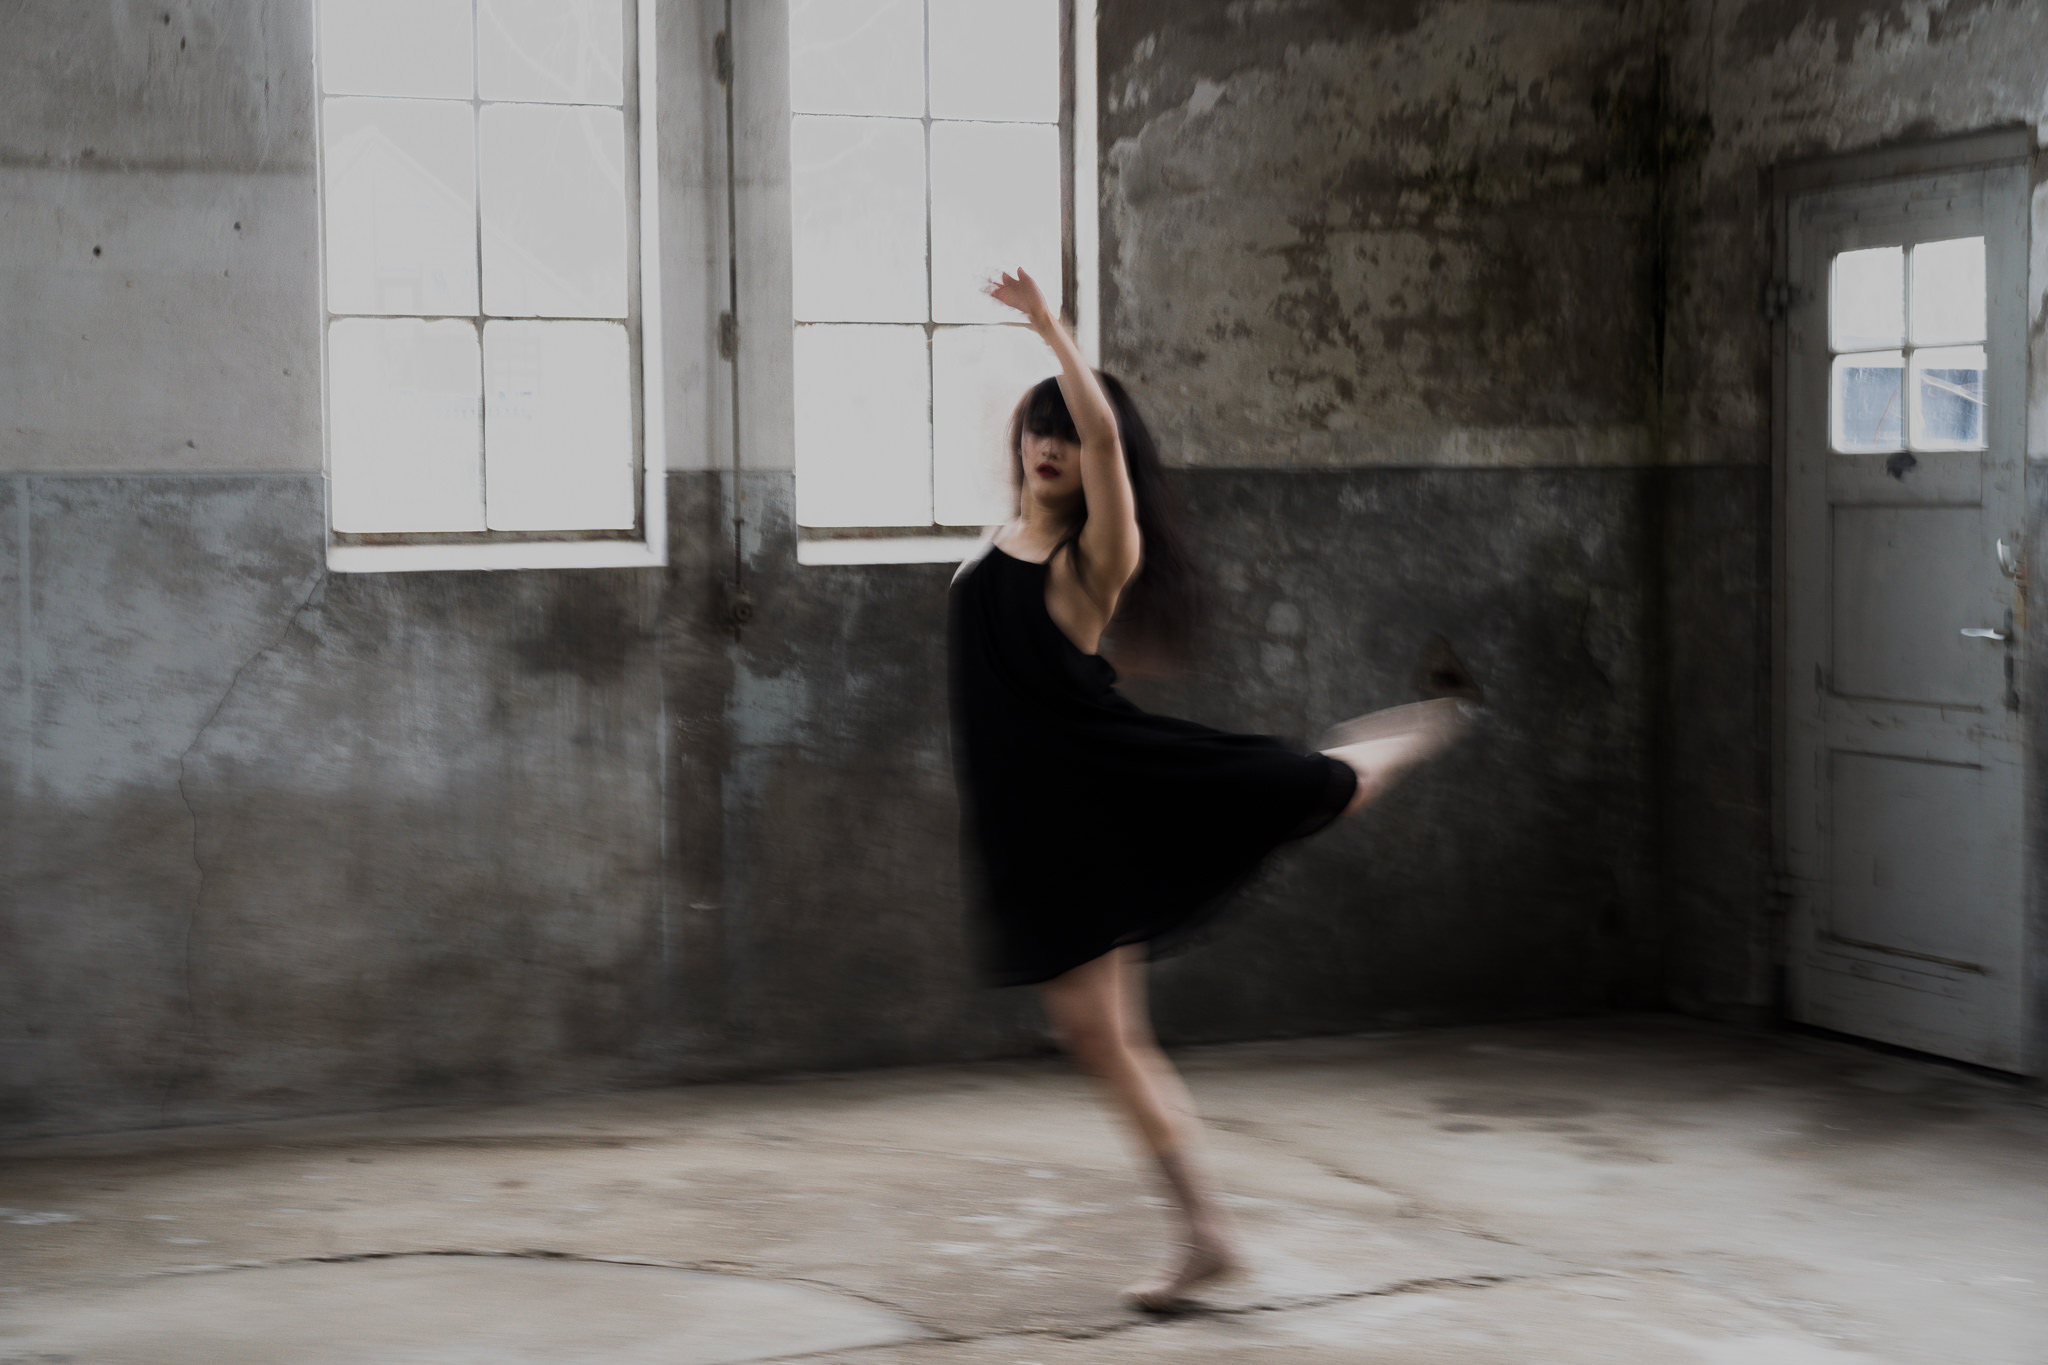 Naomi van der Kraan - Modern dance - artistic photography 02.jpg